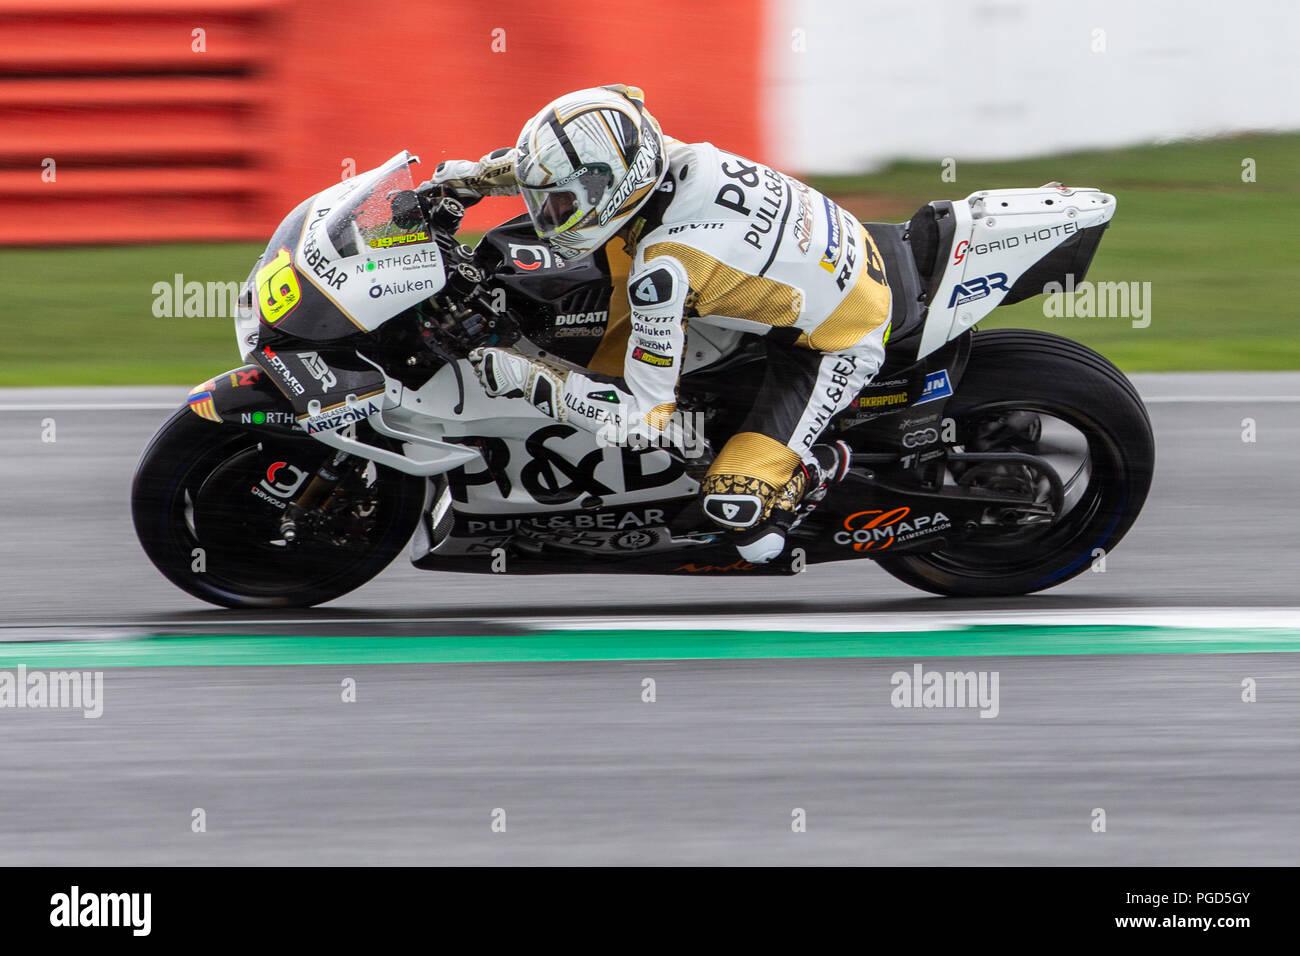 Silverstone Race Circuit Northamptonshire Uk 25th Aug 2018